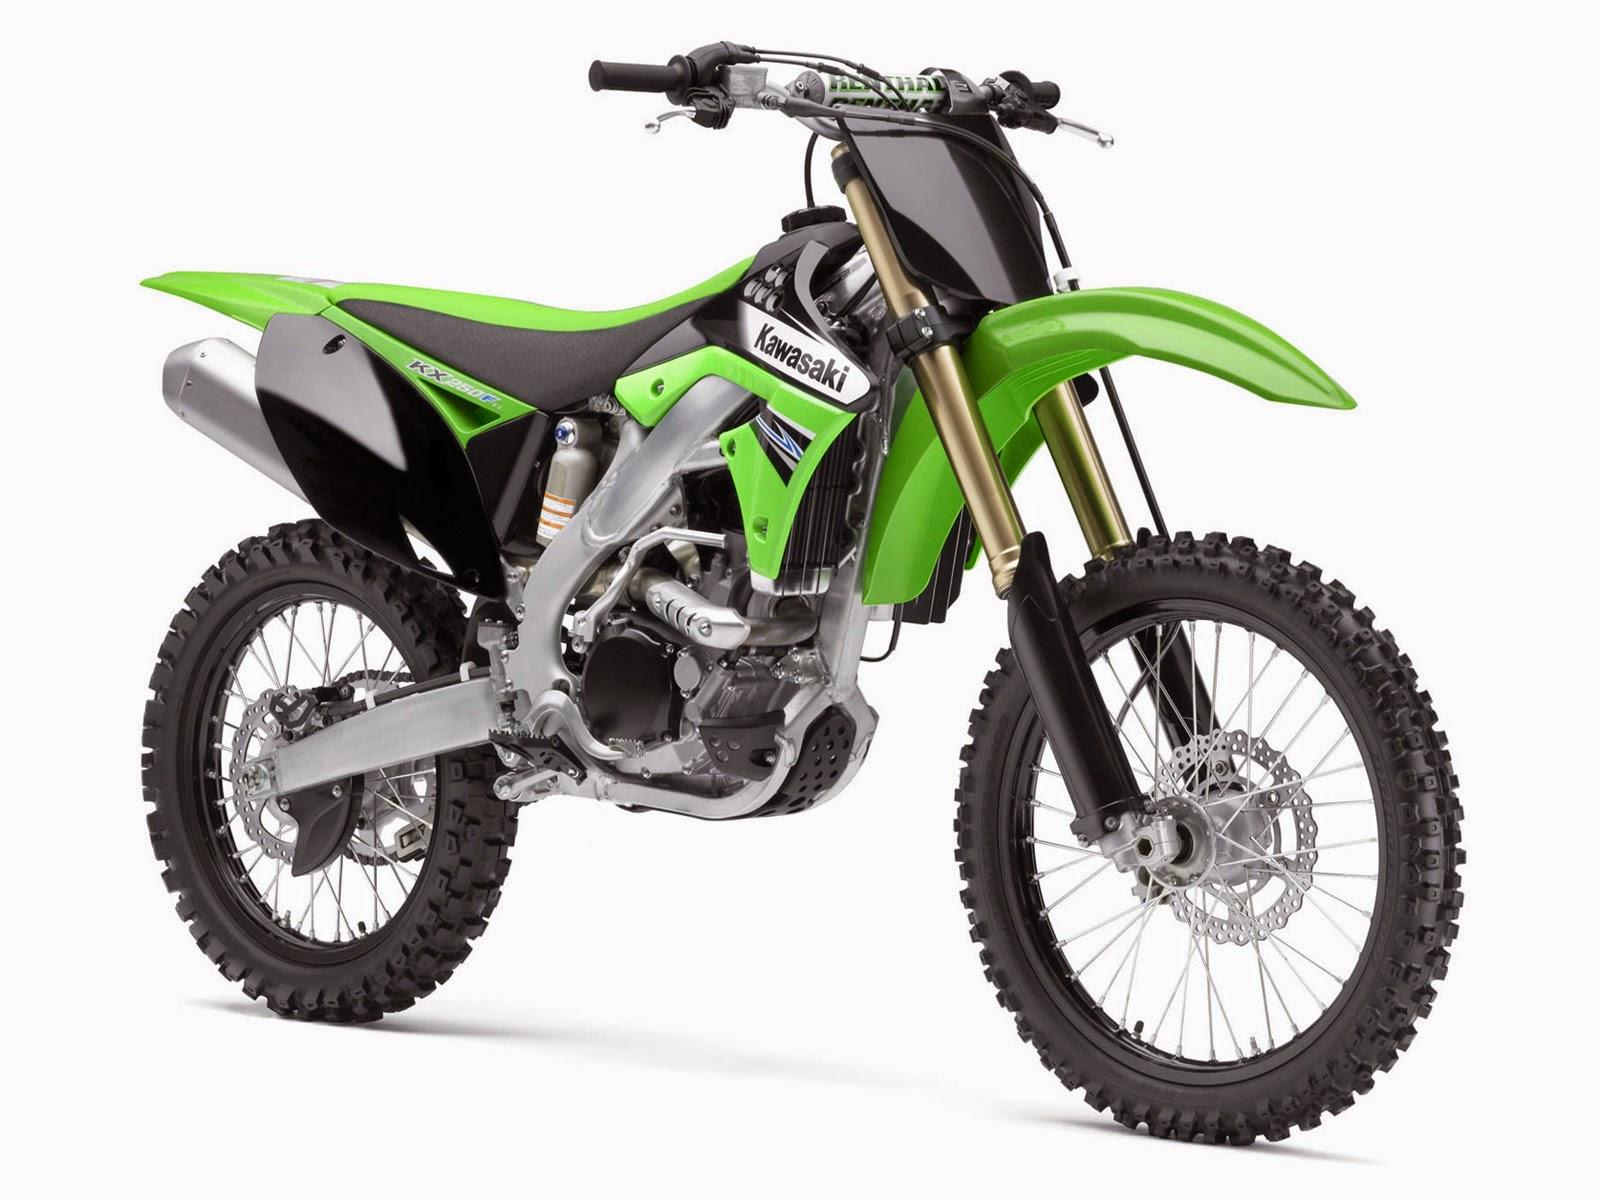 Harga Motor Bekas Kawasaki Klx